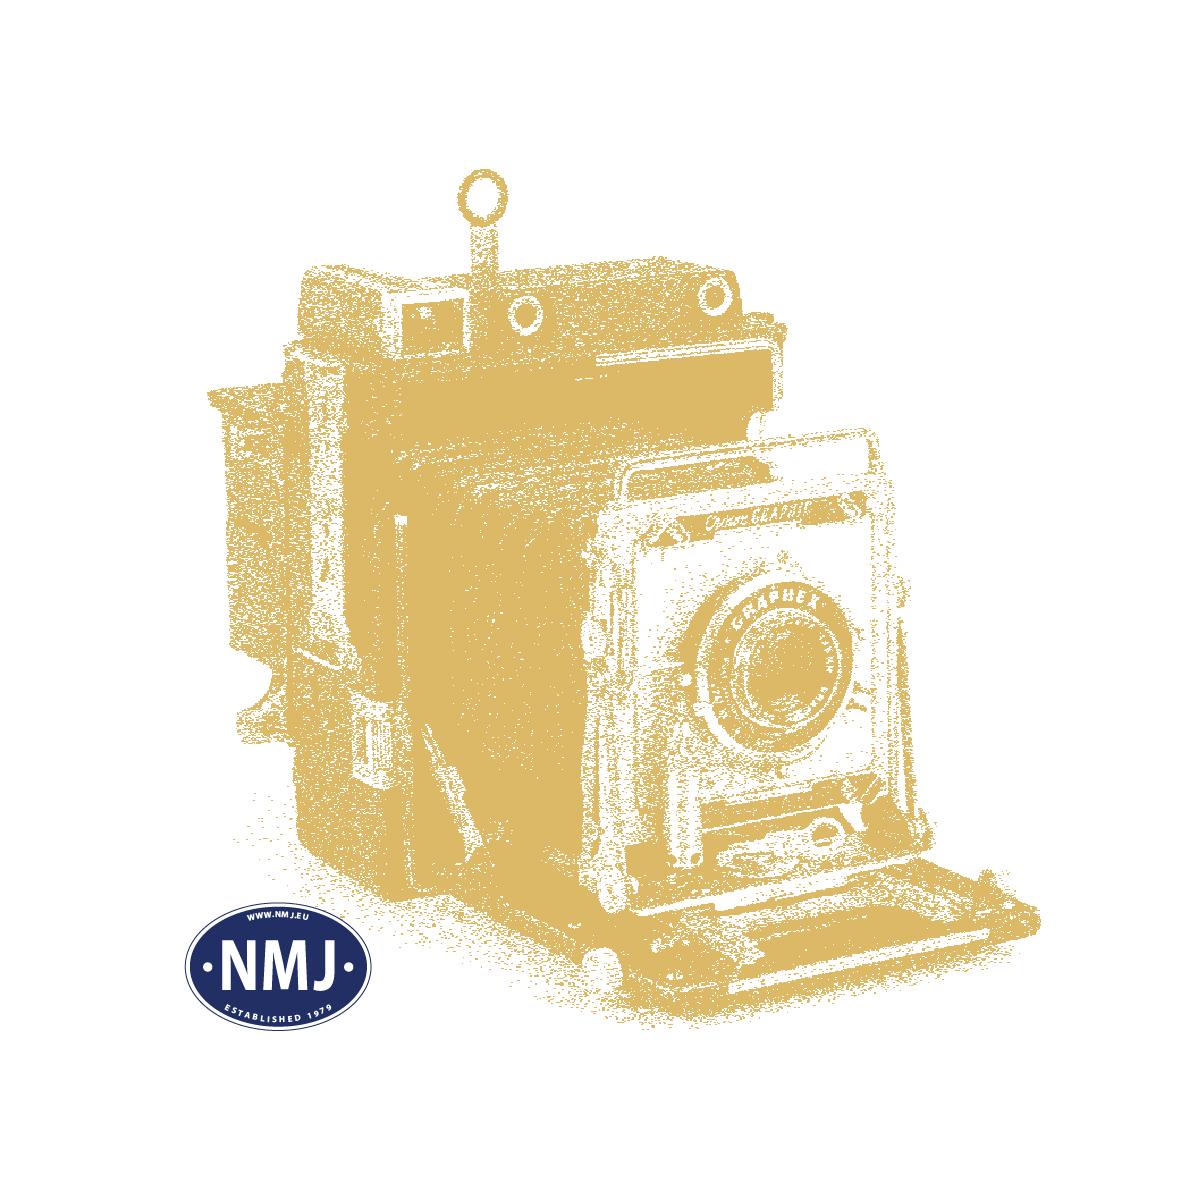 NMJT81.992 - NMJ Topline BM71/73, Main PCB w/ Lights